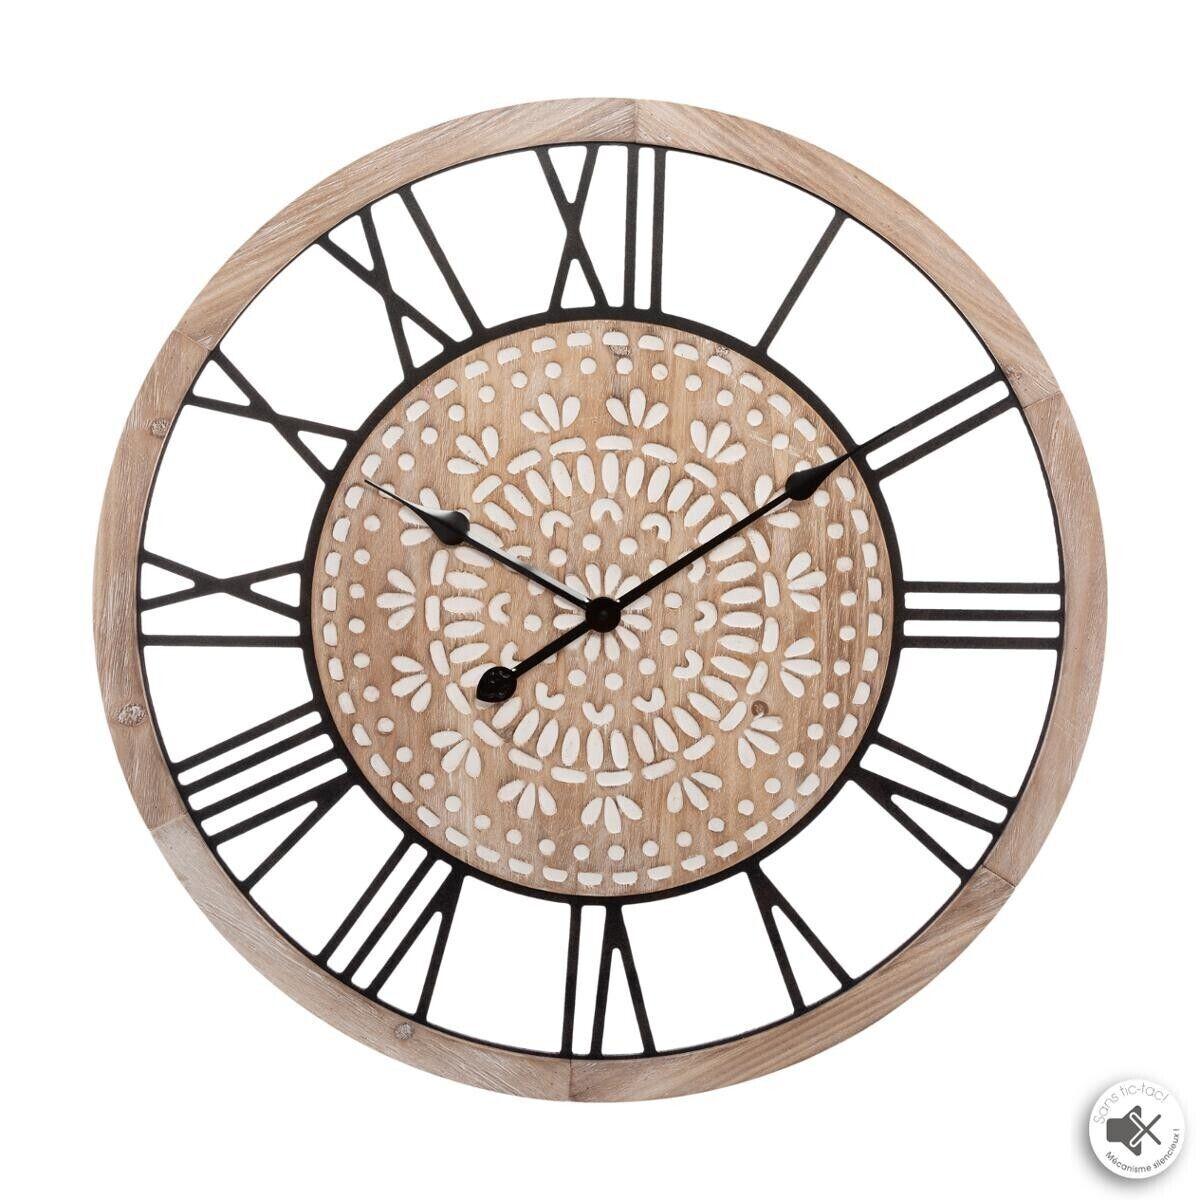 Atmosphera Horloge gravée en bois D67 cm